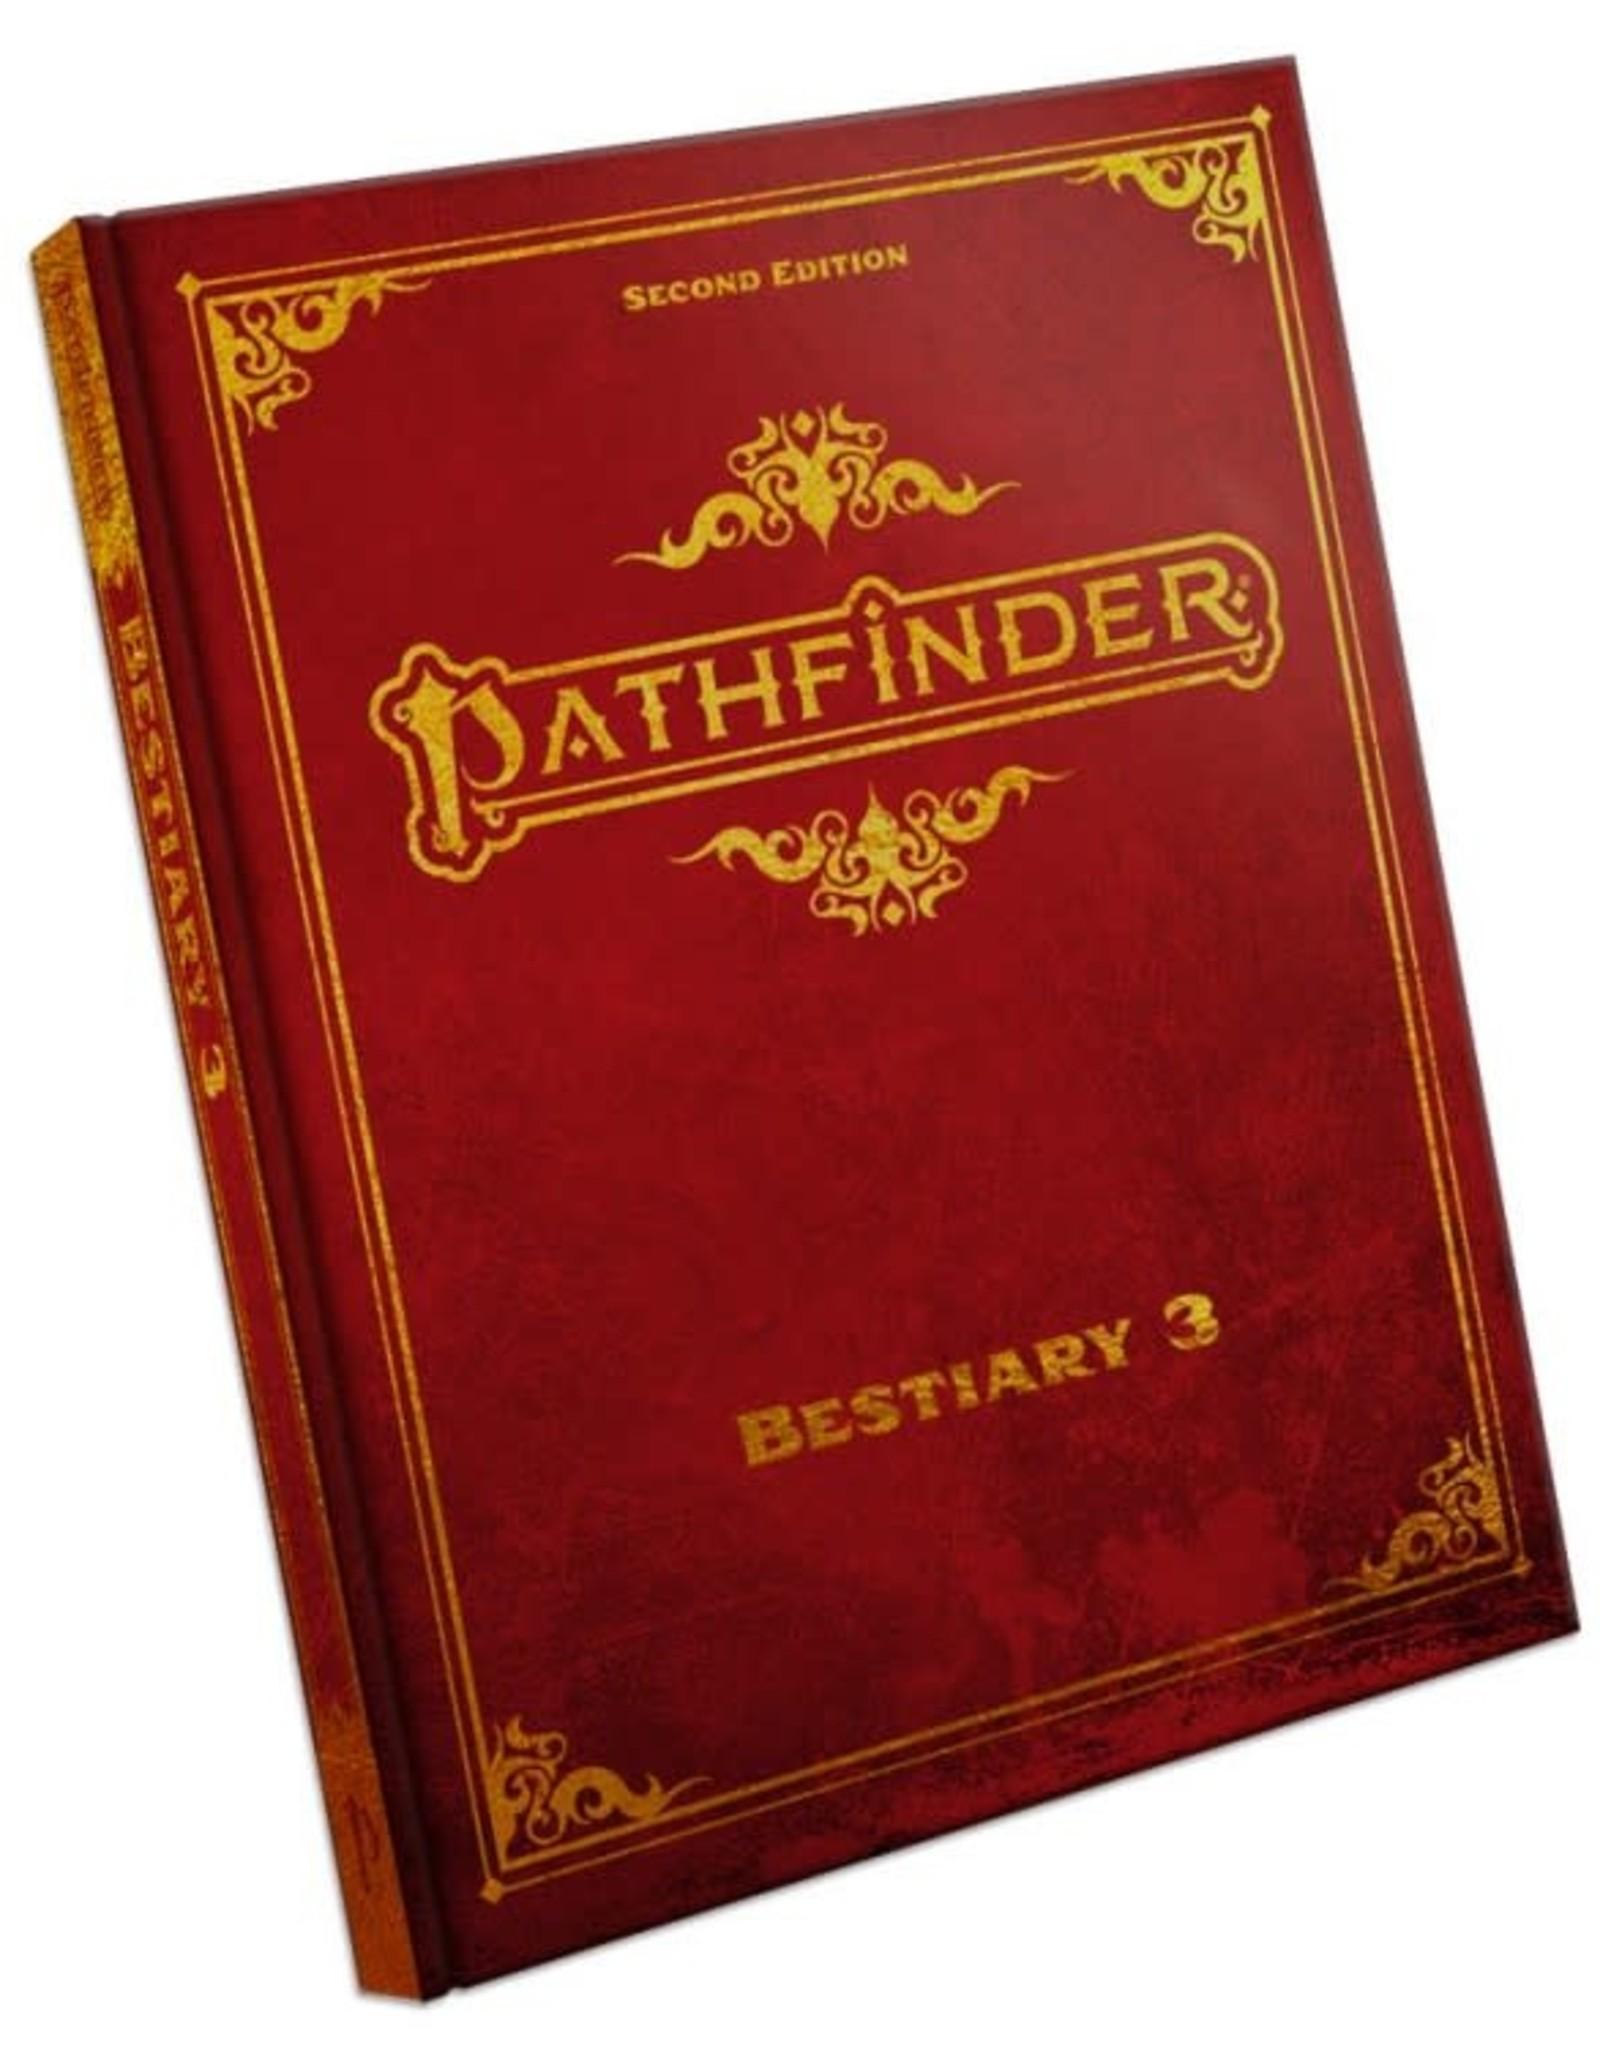 PAIZO Pathfinder 2E: Bestiary 3 Special Edition